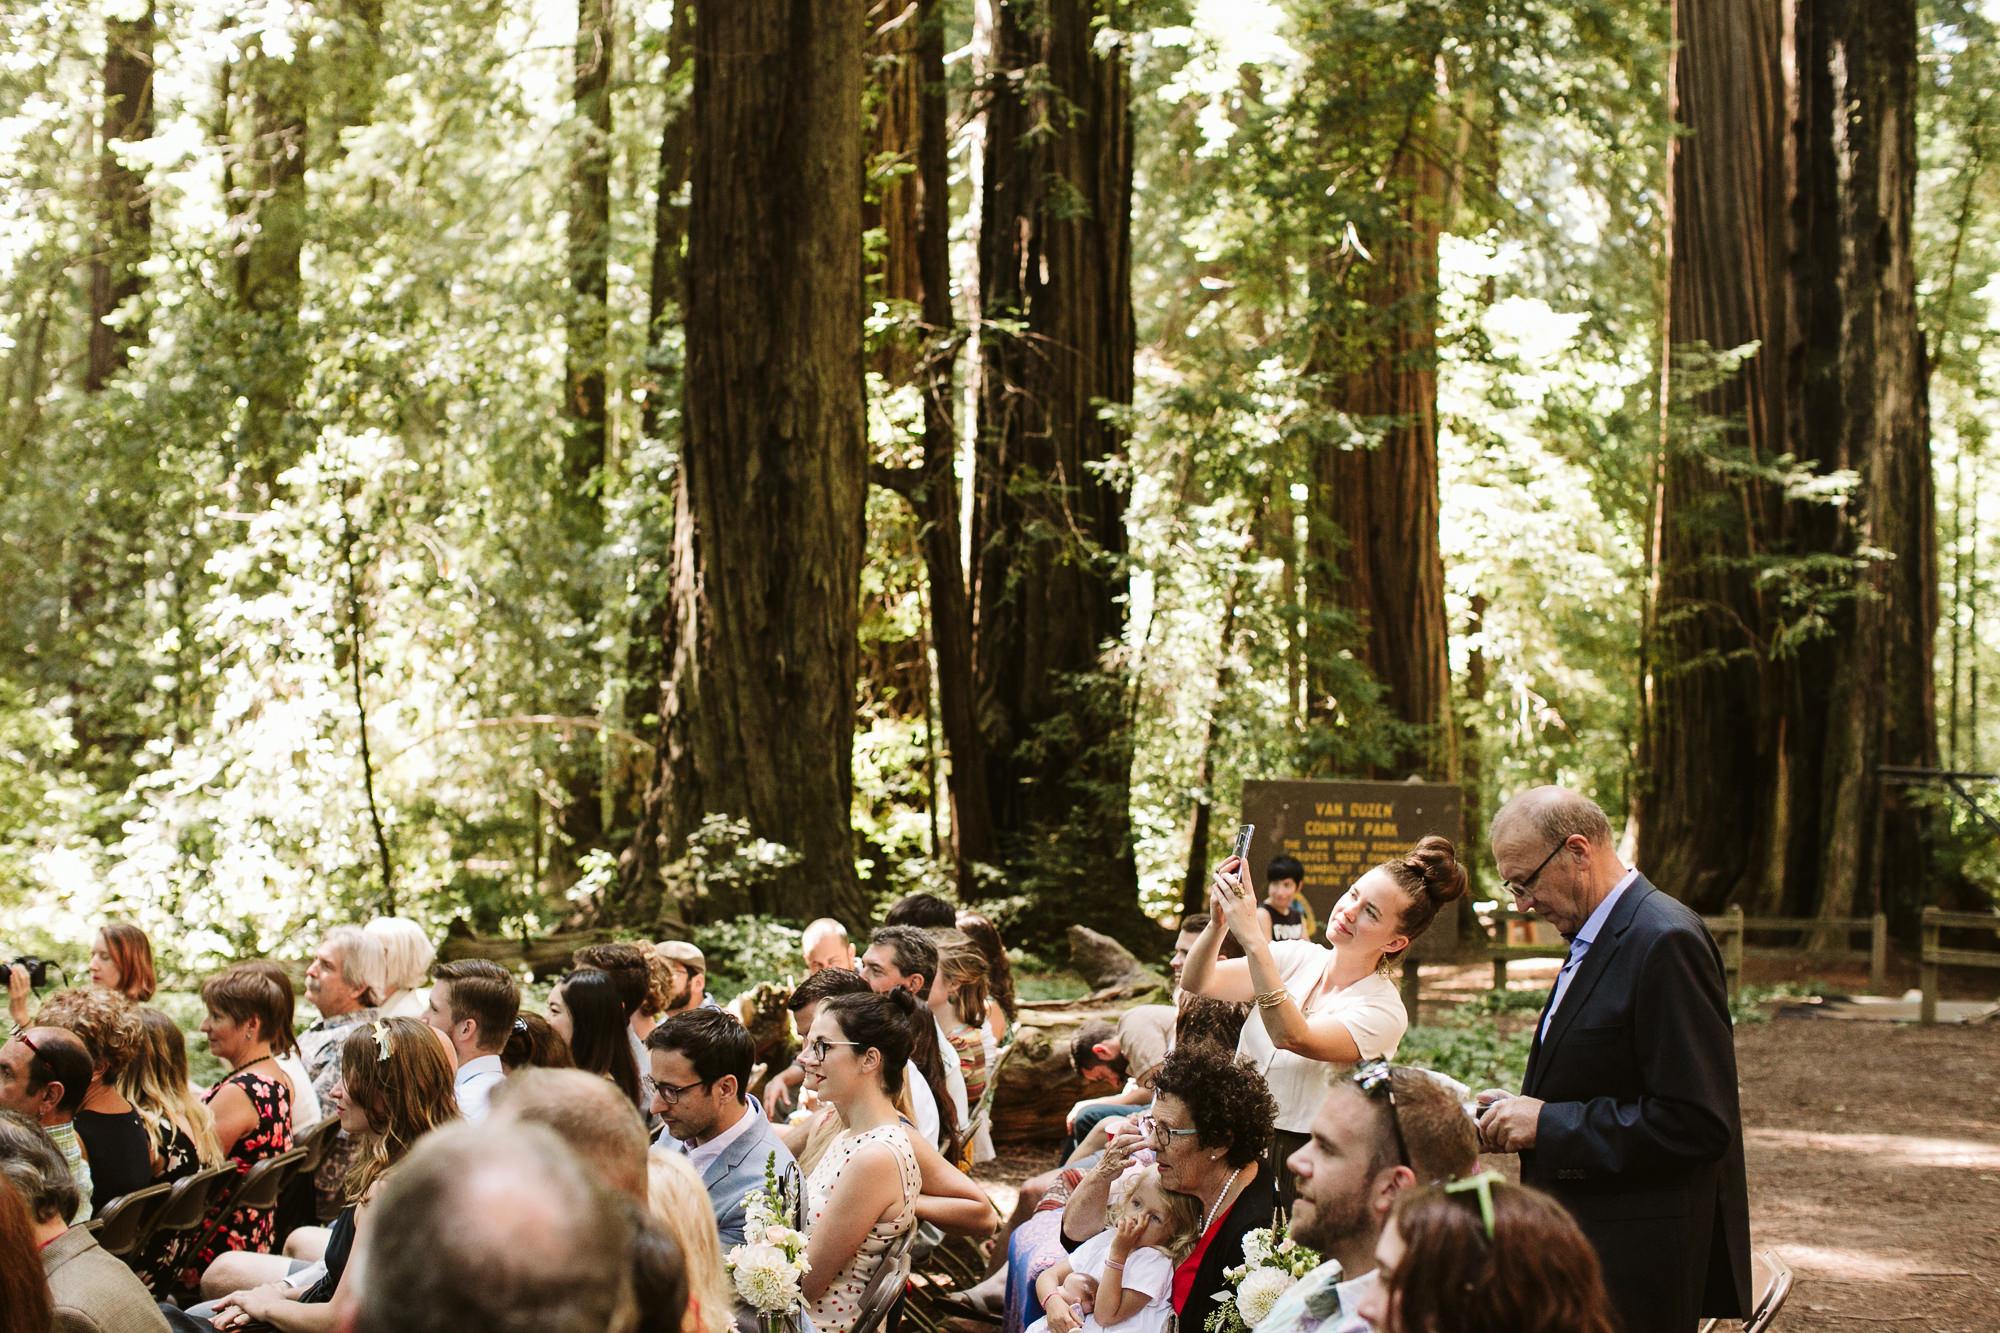 California-wedding-photographer-alfonso-flores-pamplin-groove-184.jpg